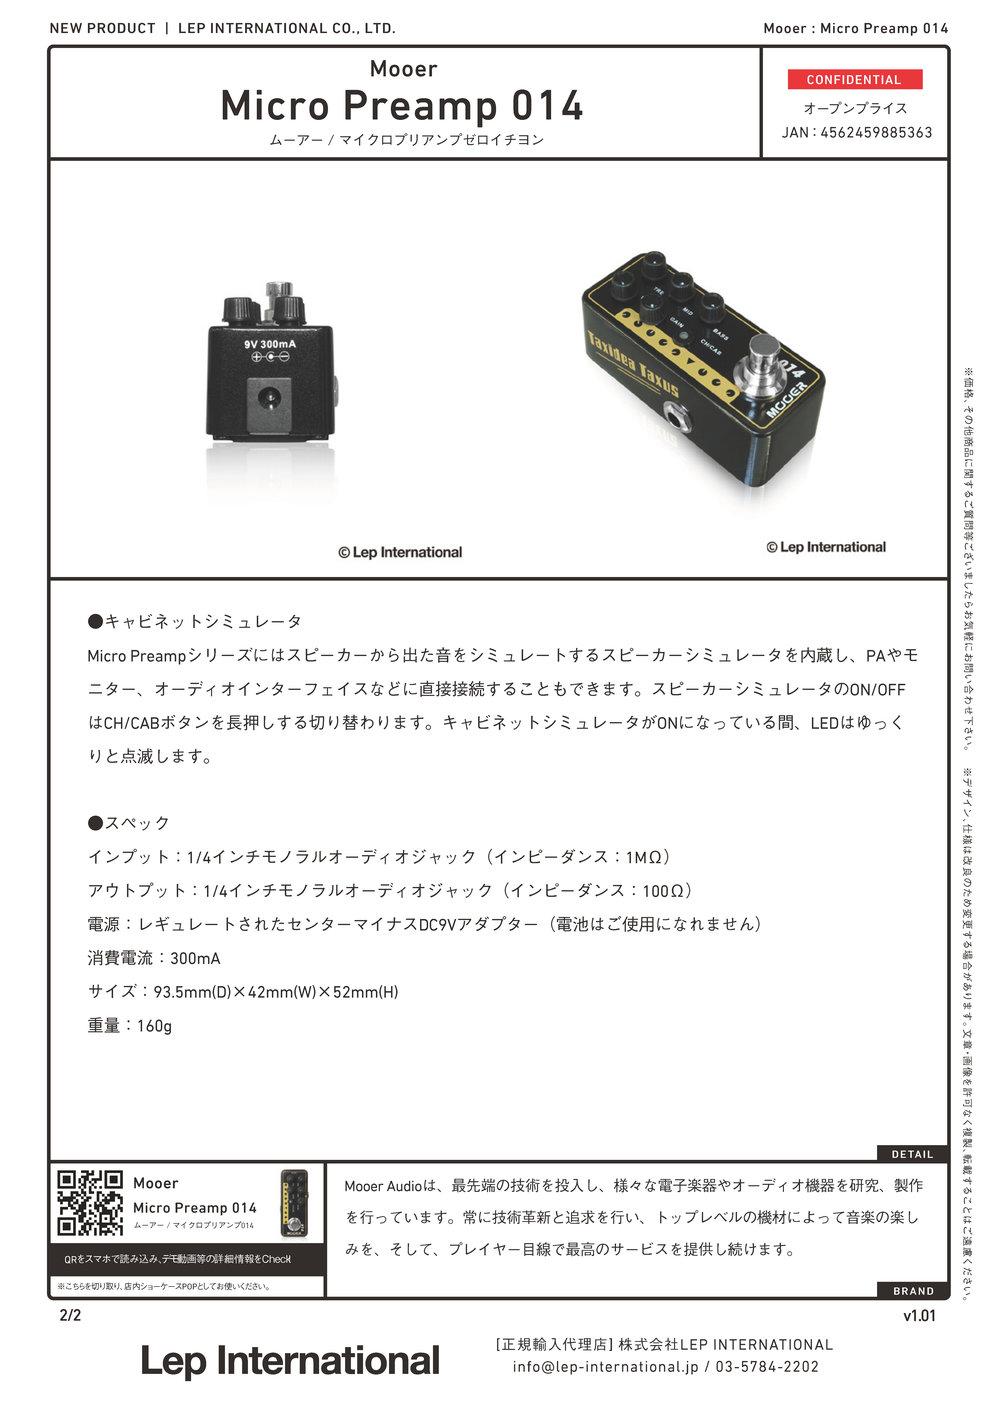 mooer micropreamp014 v1.01_ページ_2.jpg